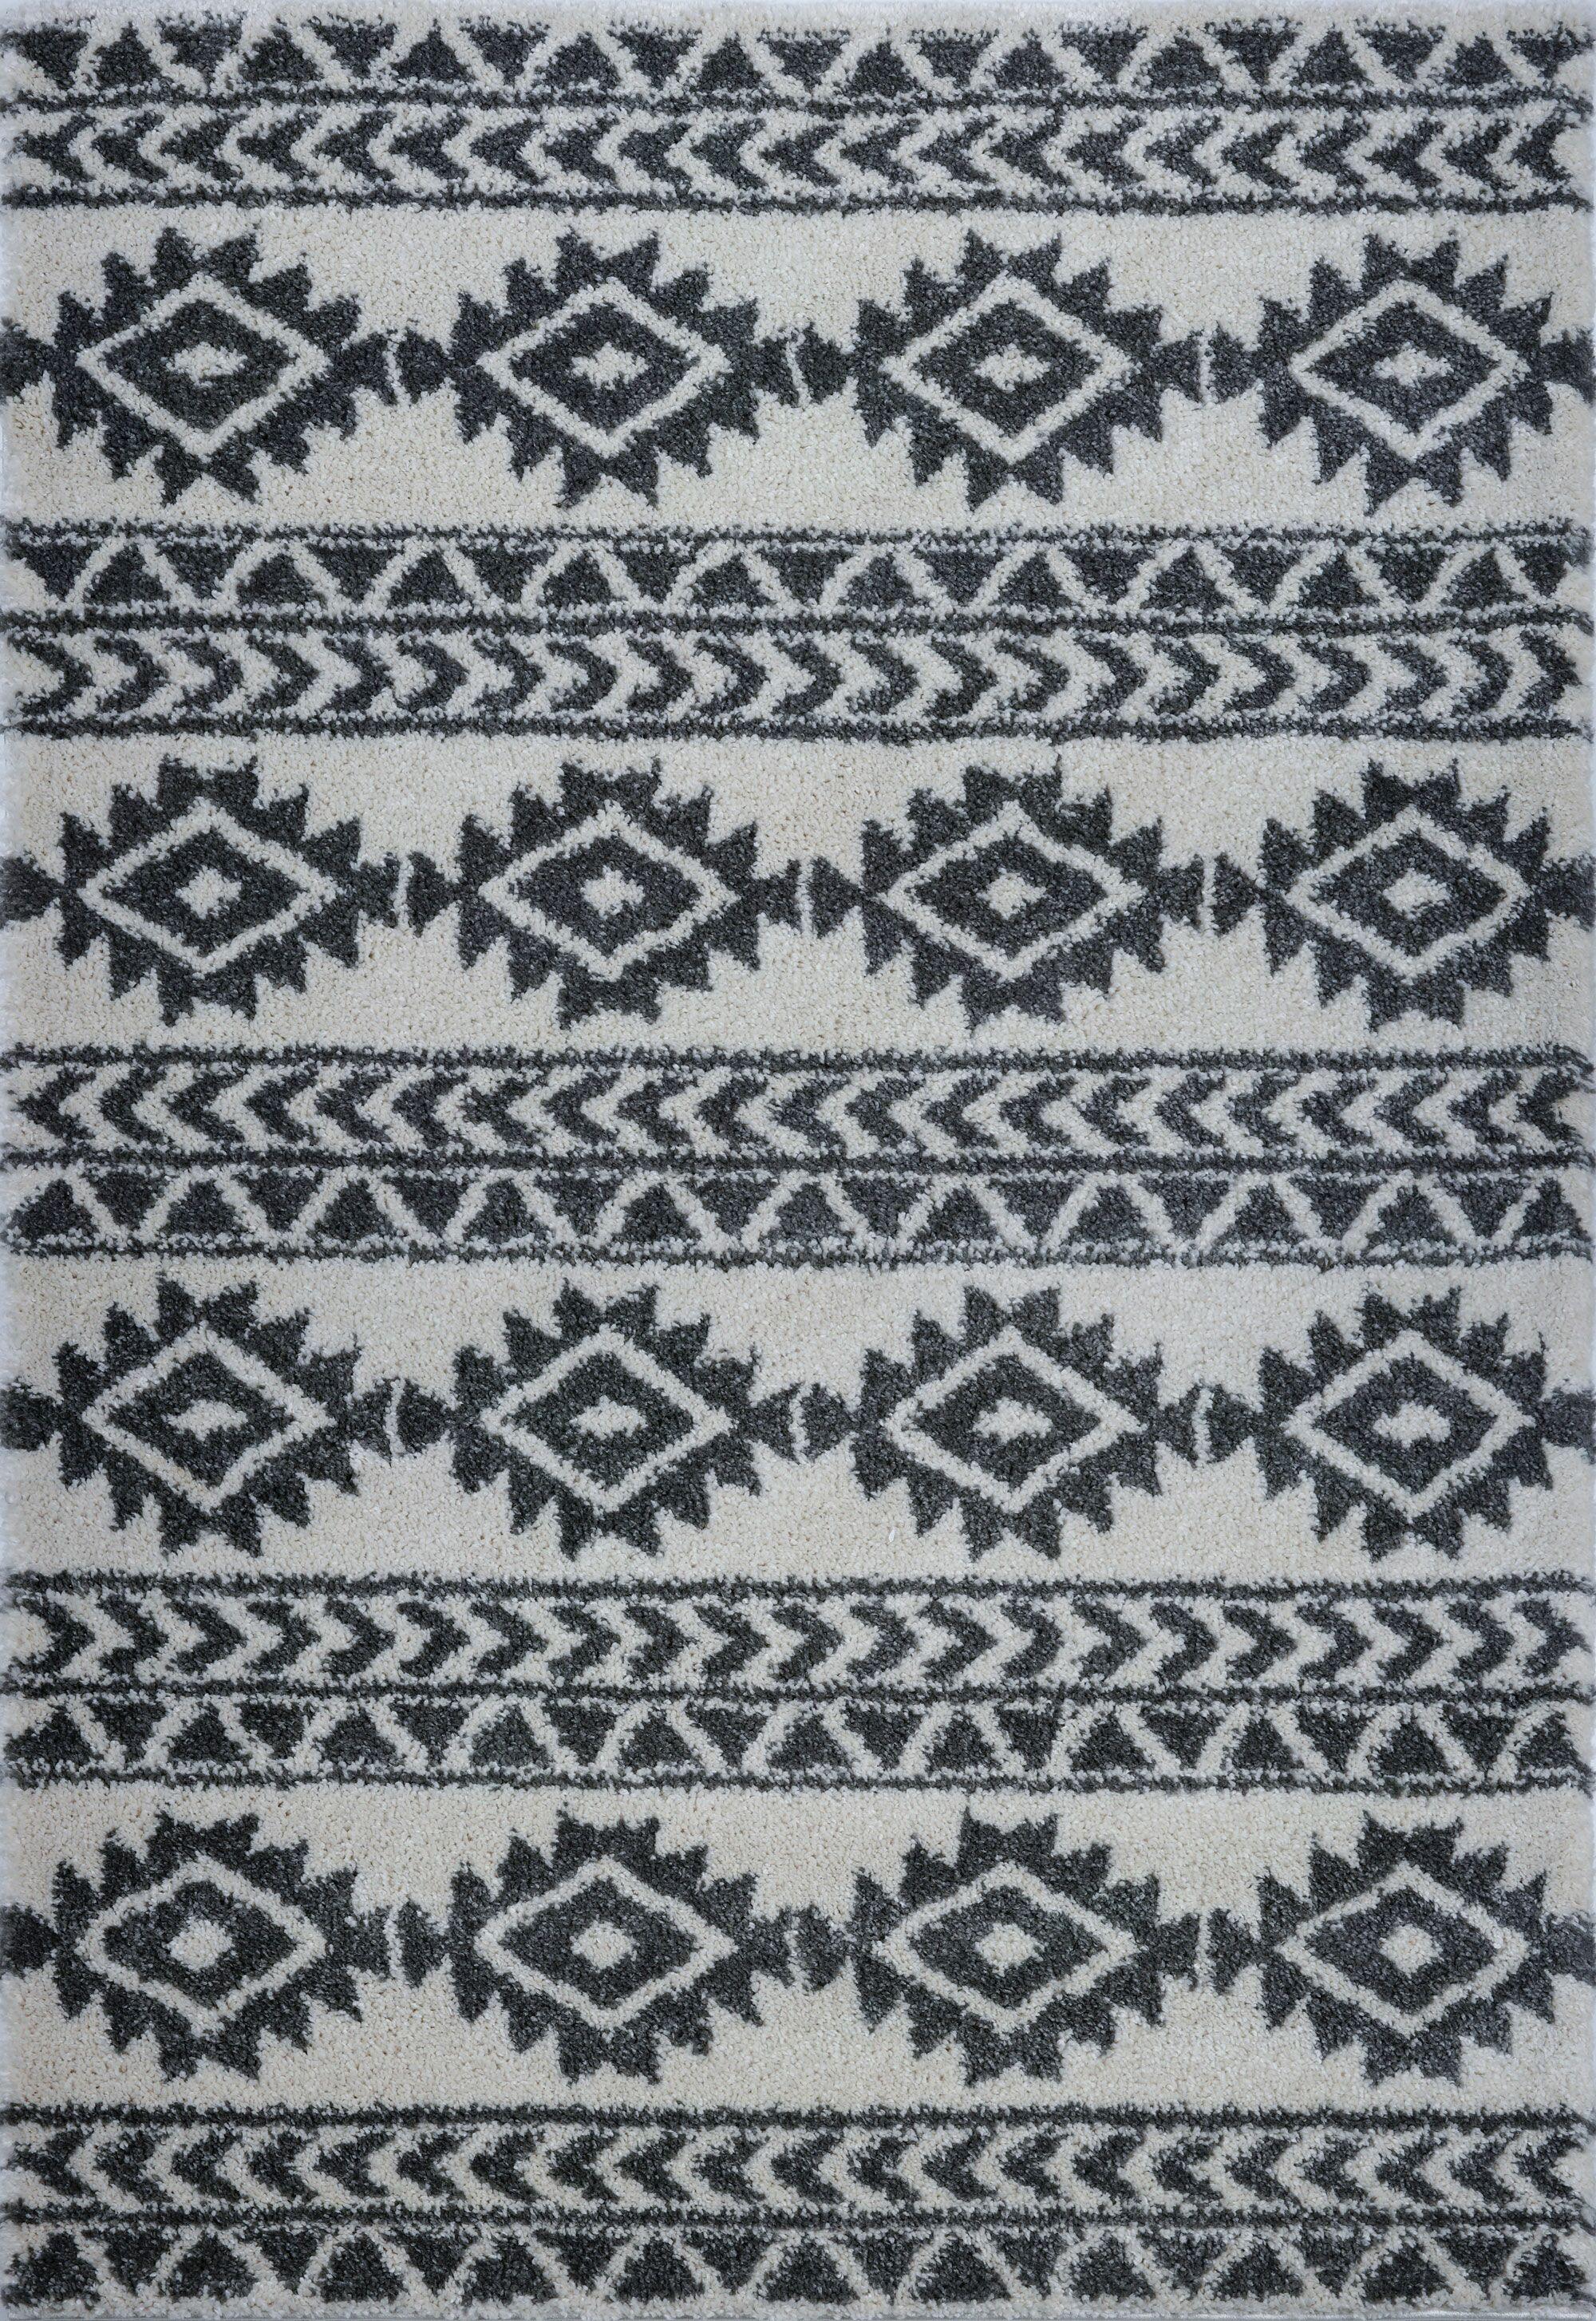 Hiebert Ivory/Black Area Rug Rug Size: Rectangle 6'5